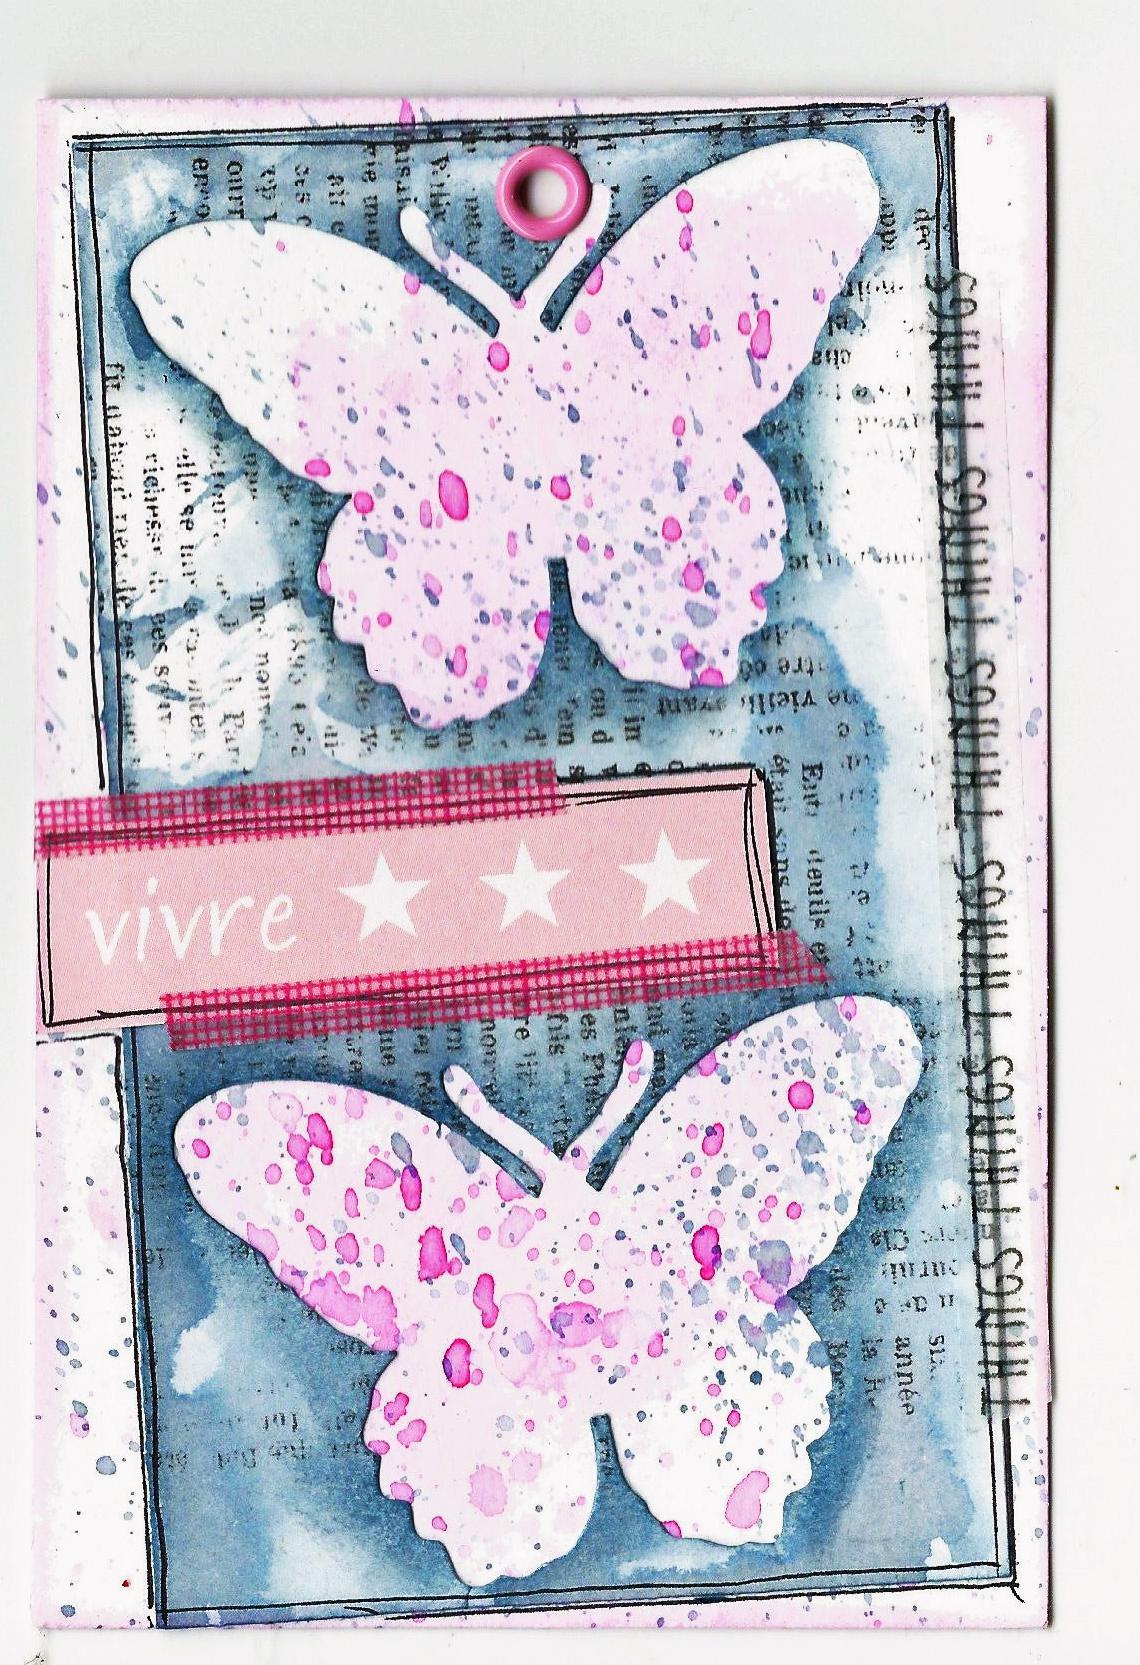 xn papillons